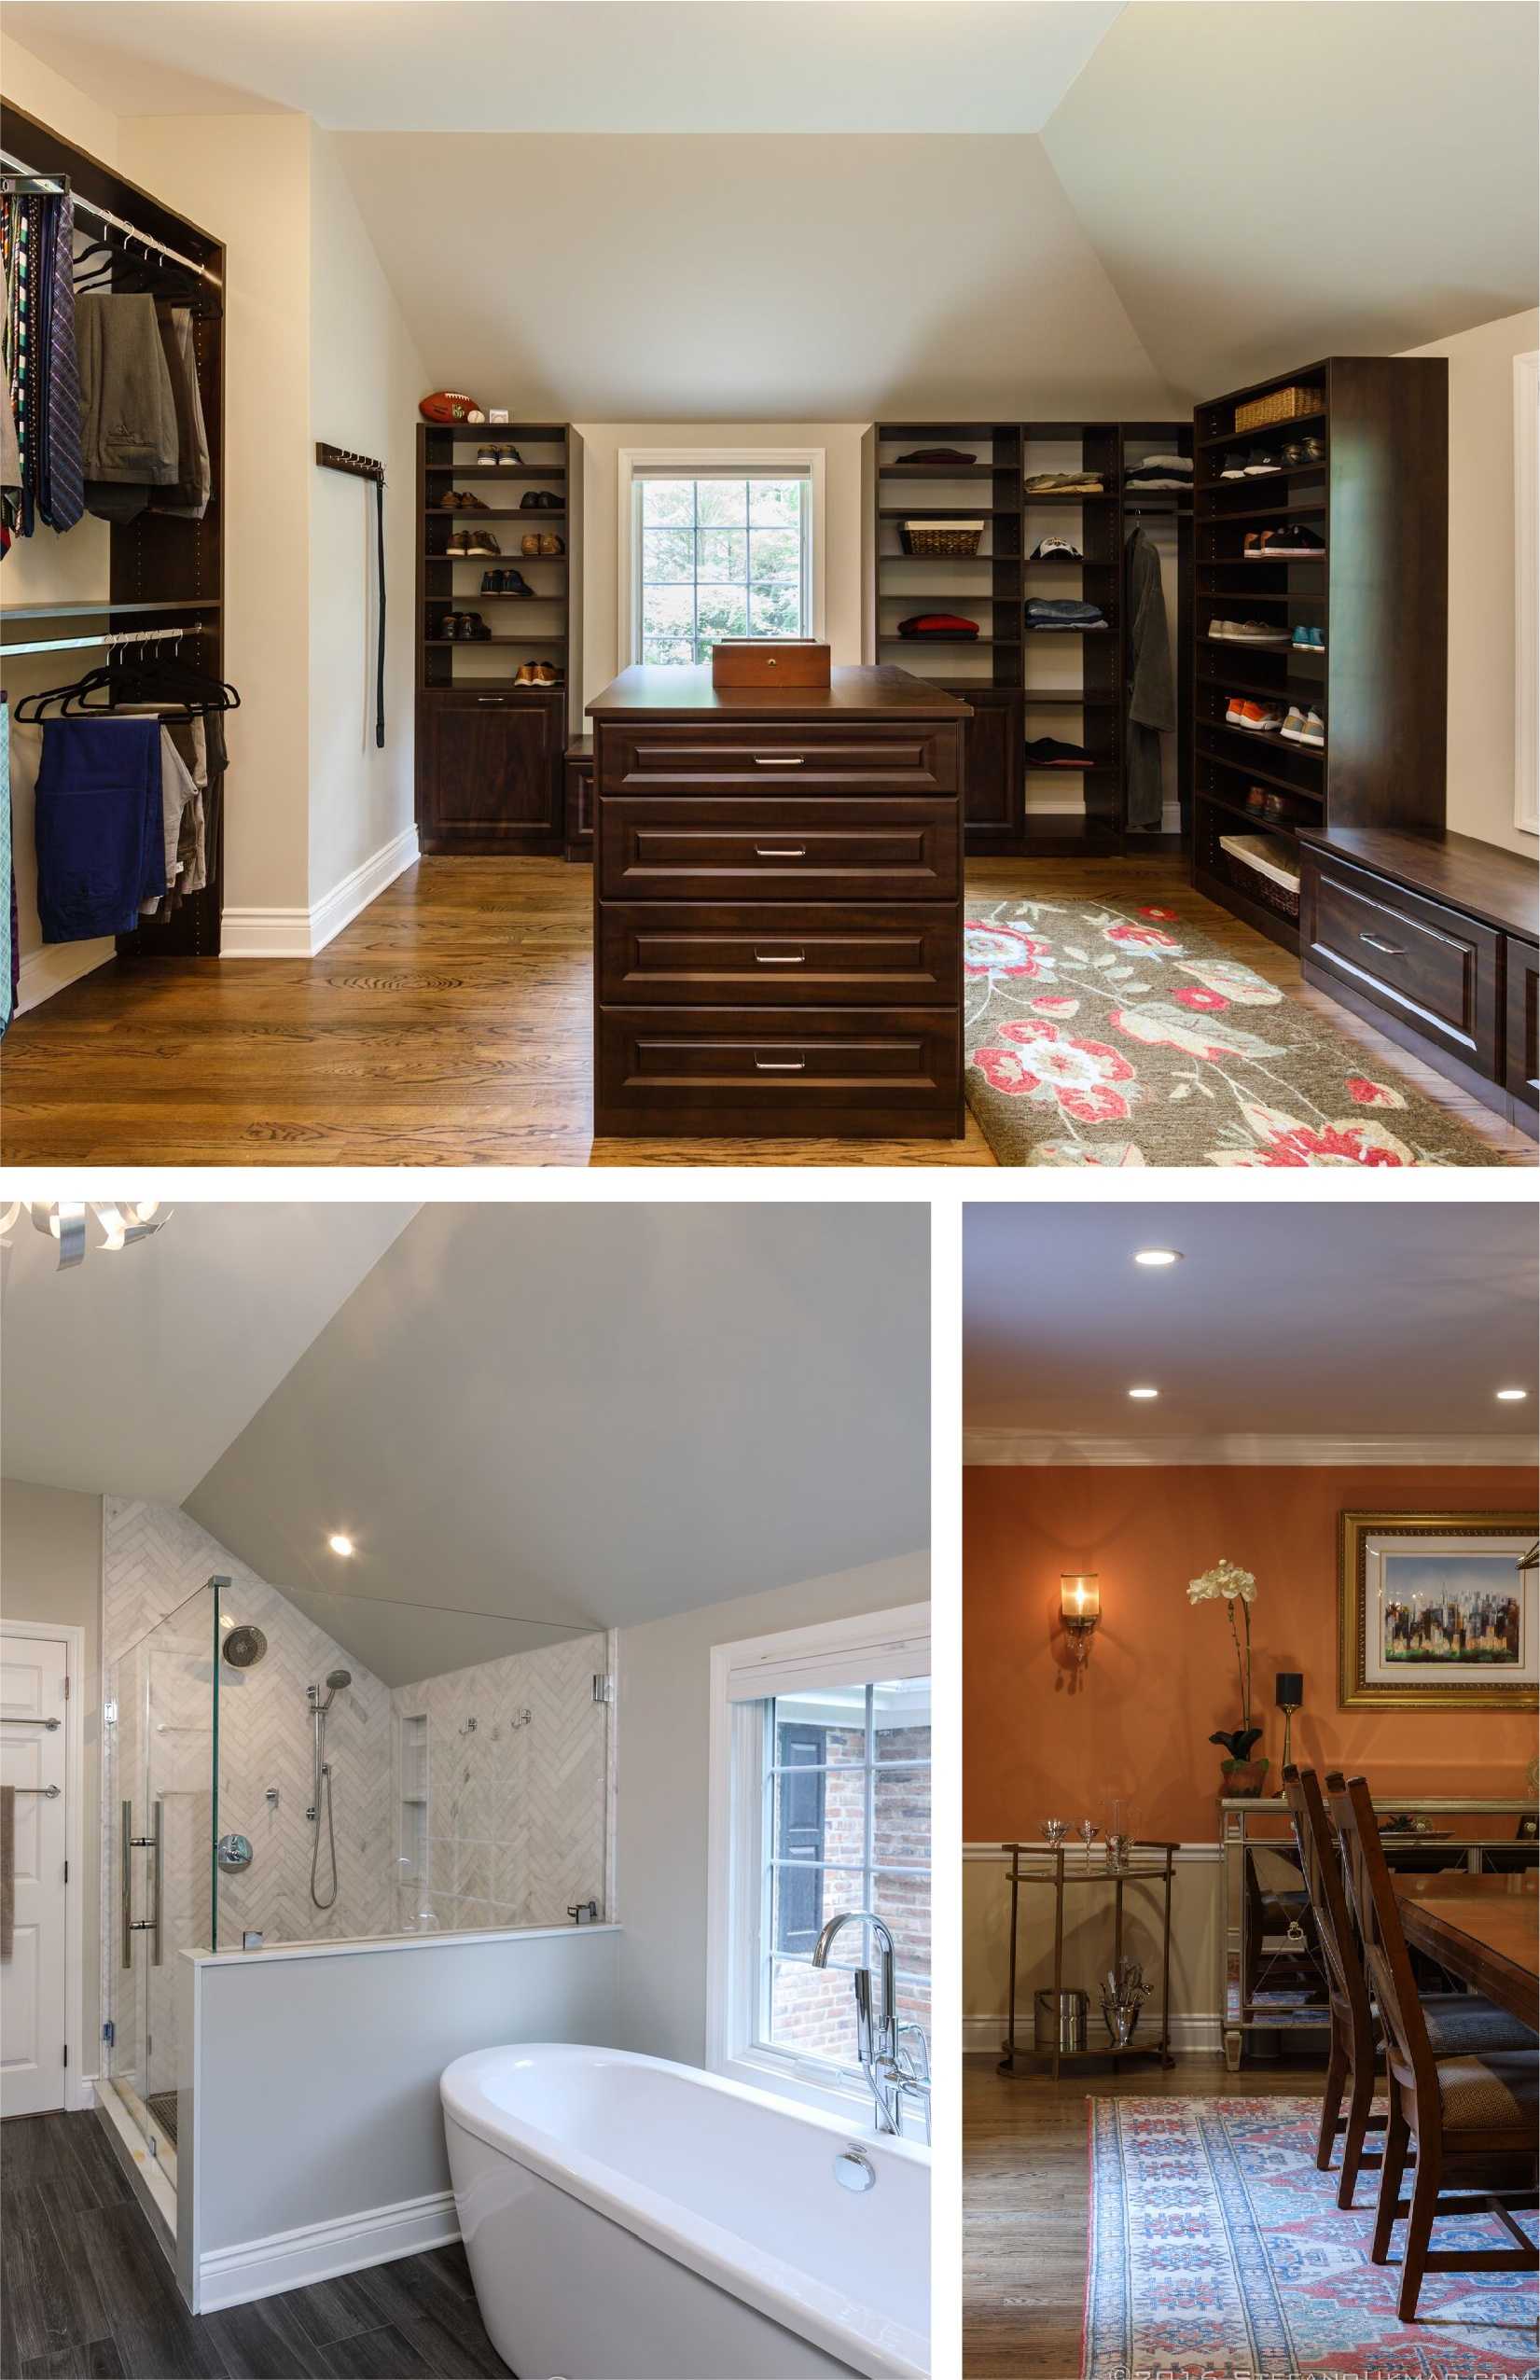 gw-combs-interior-collage-04.jpg